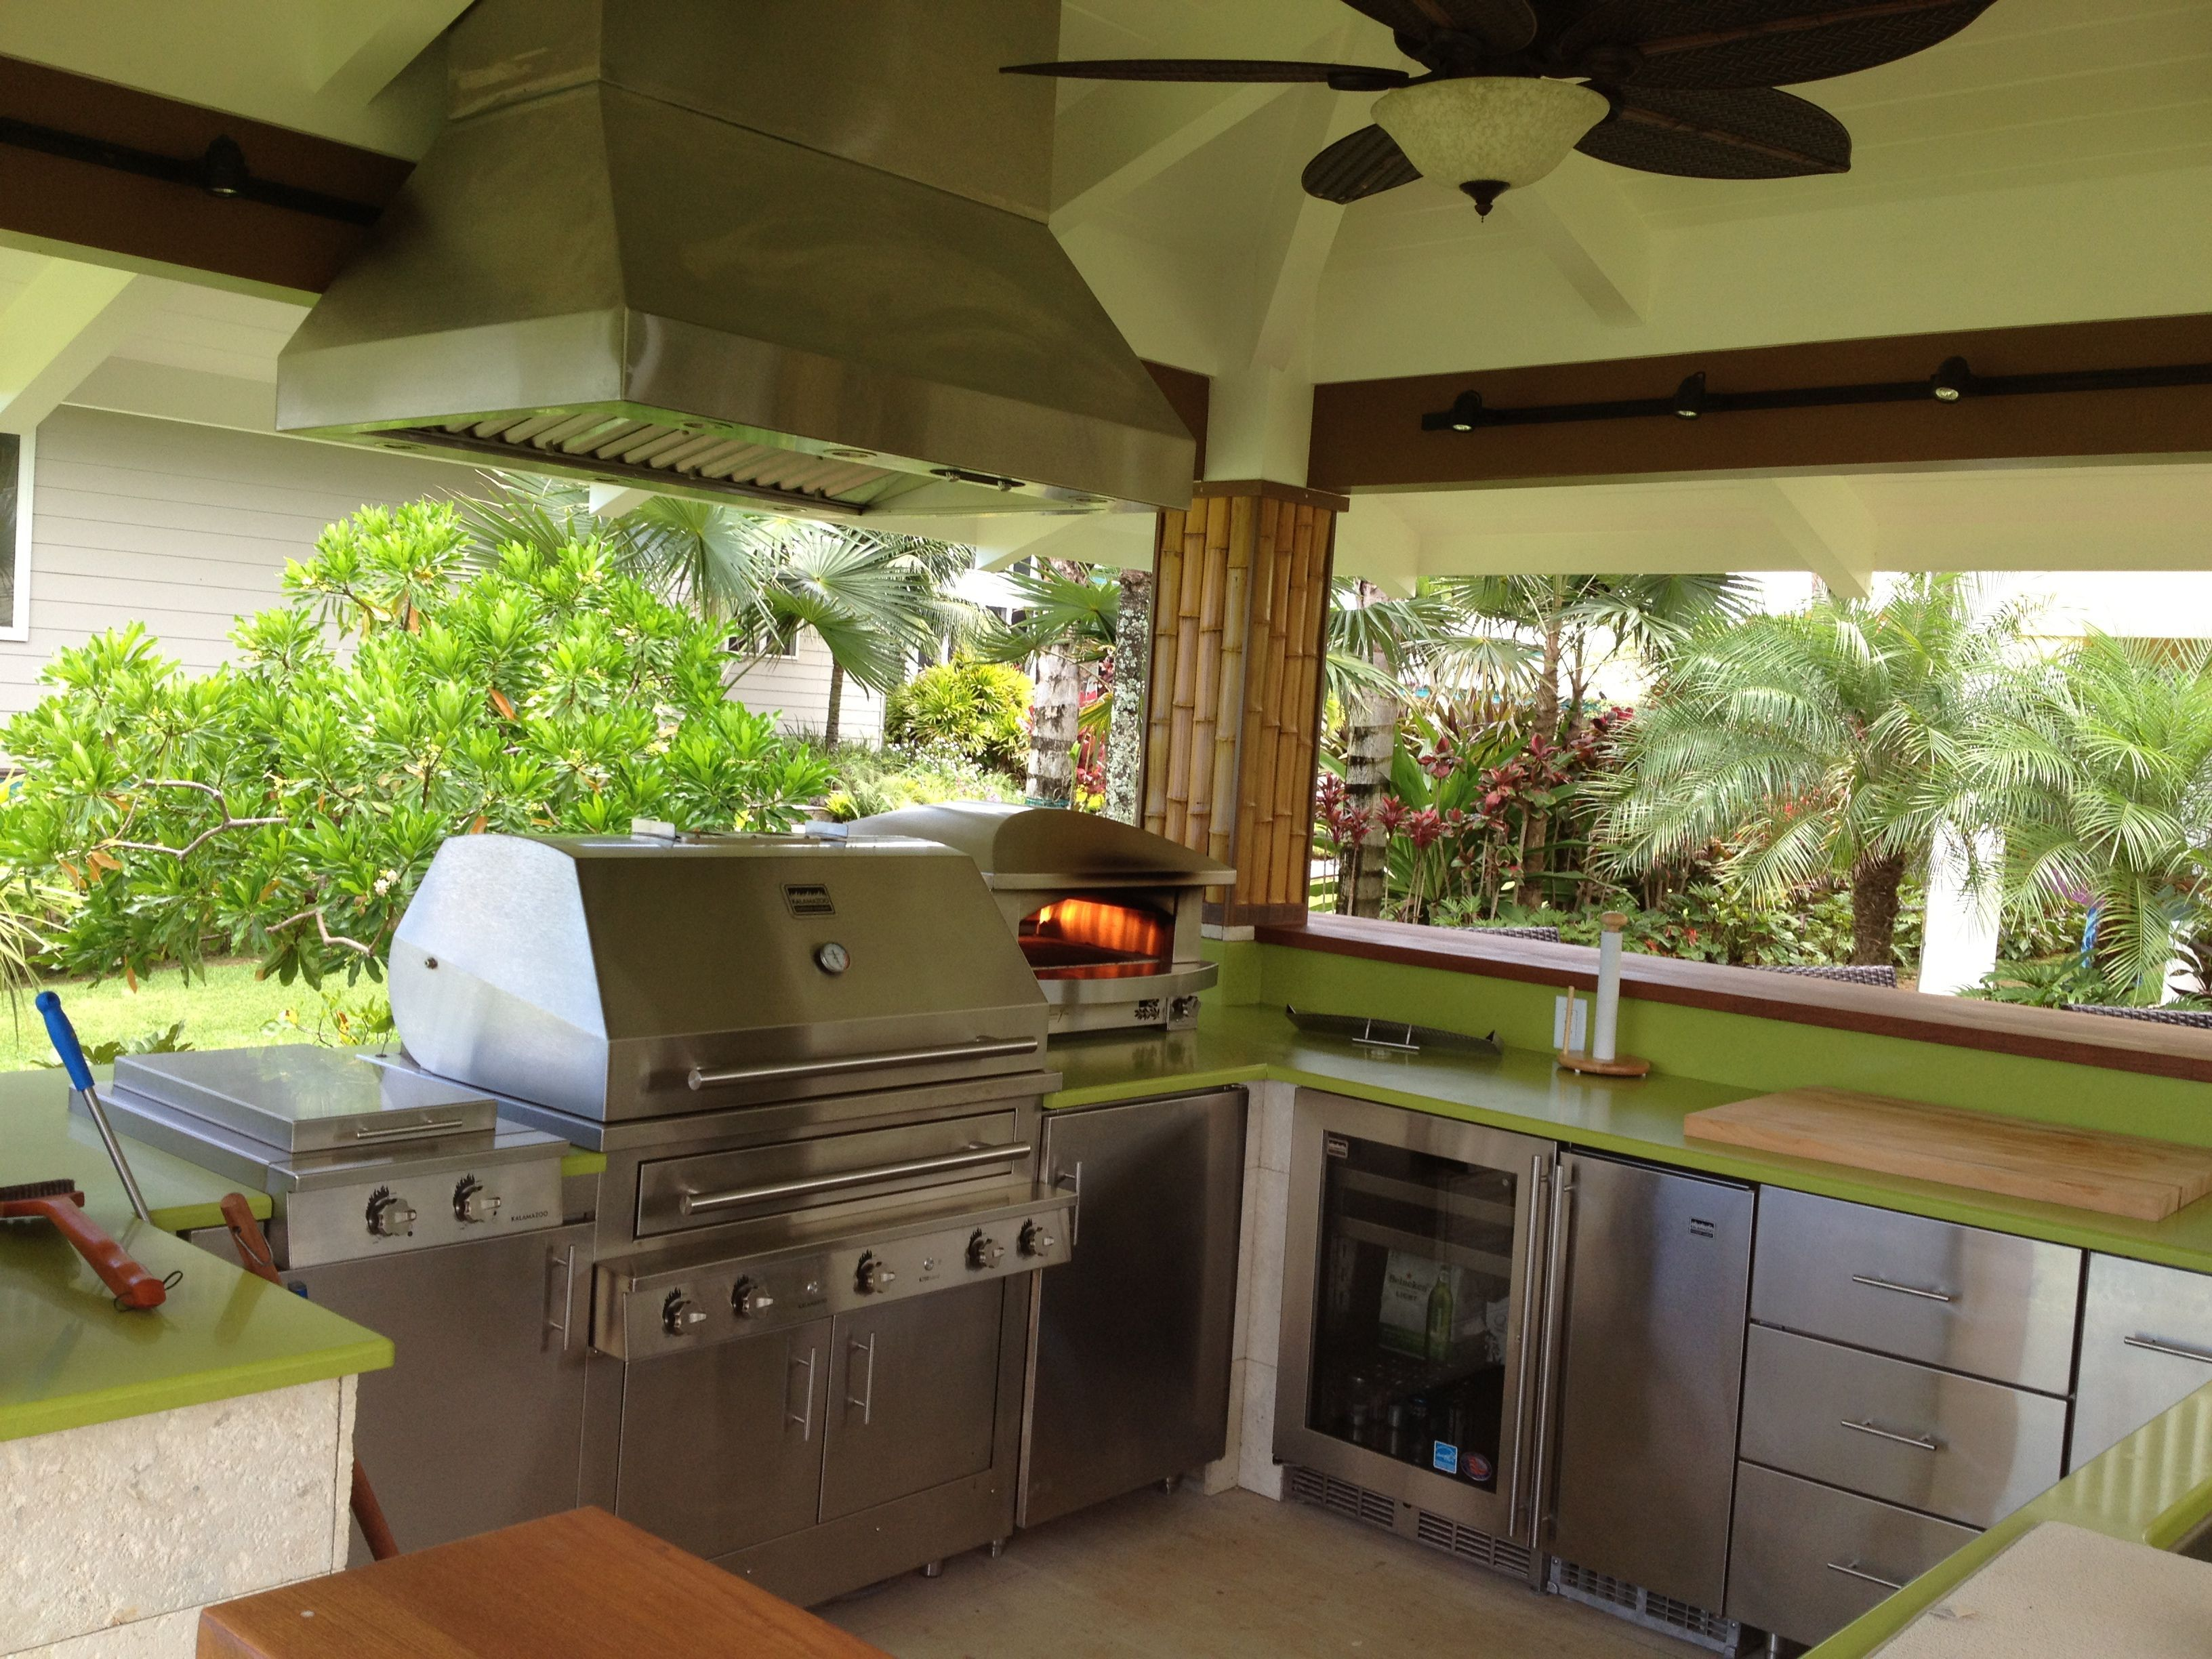 Kalamazoo Outdoor Gourmet Kitchen In Hawaii Outdoor Appliances Outdoor Kitchen